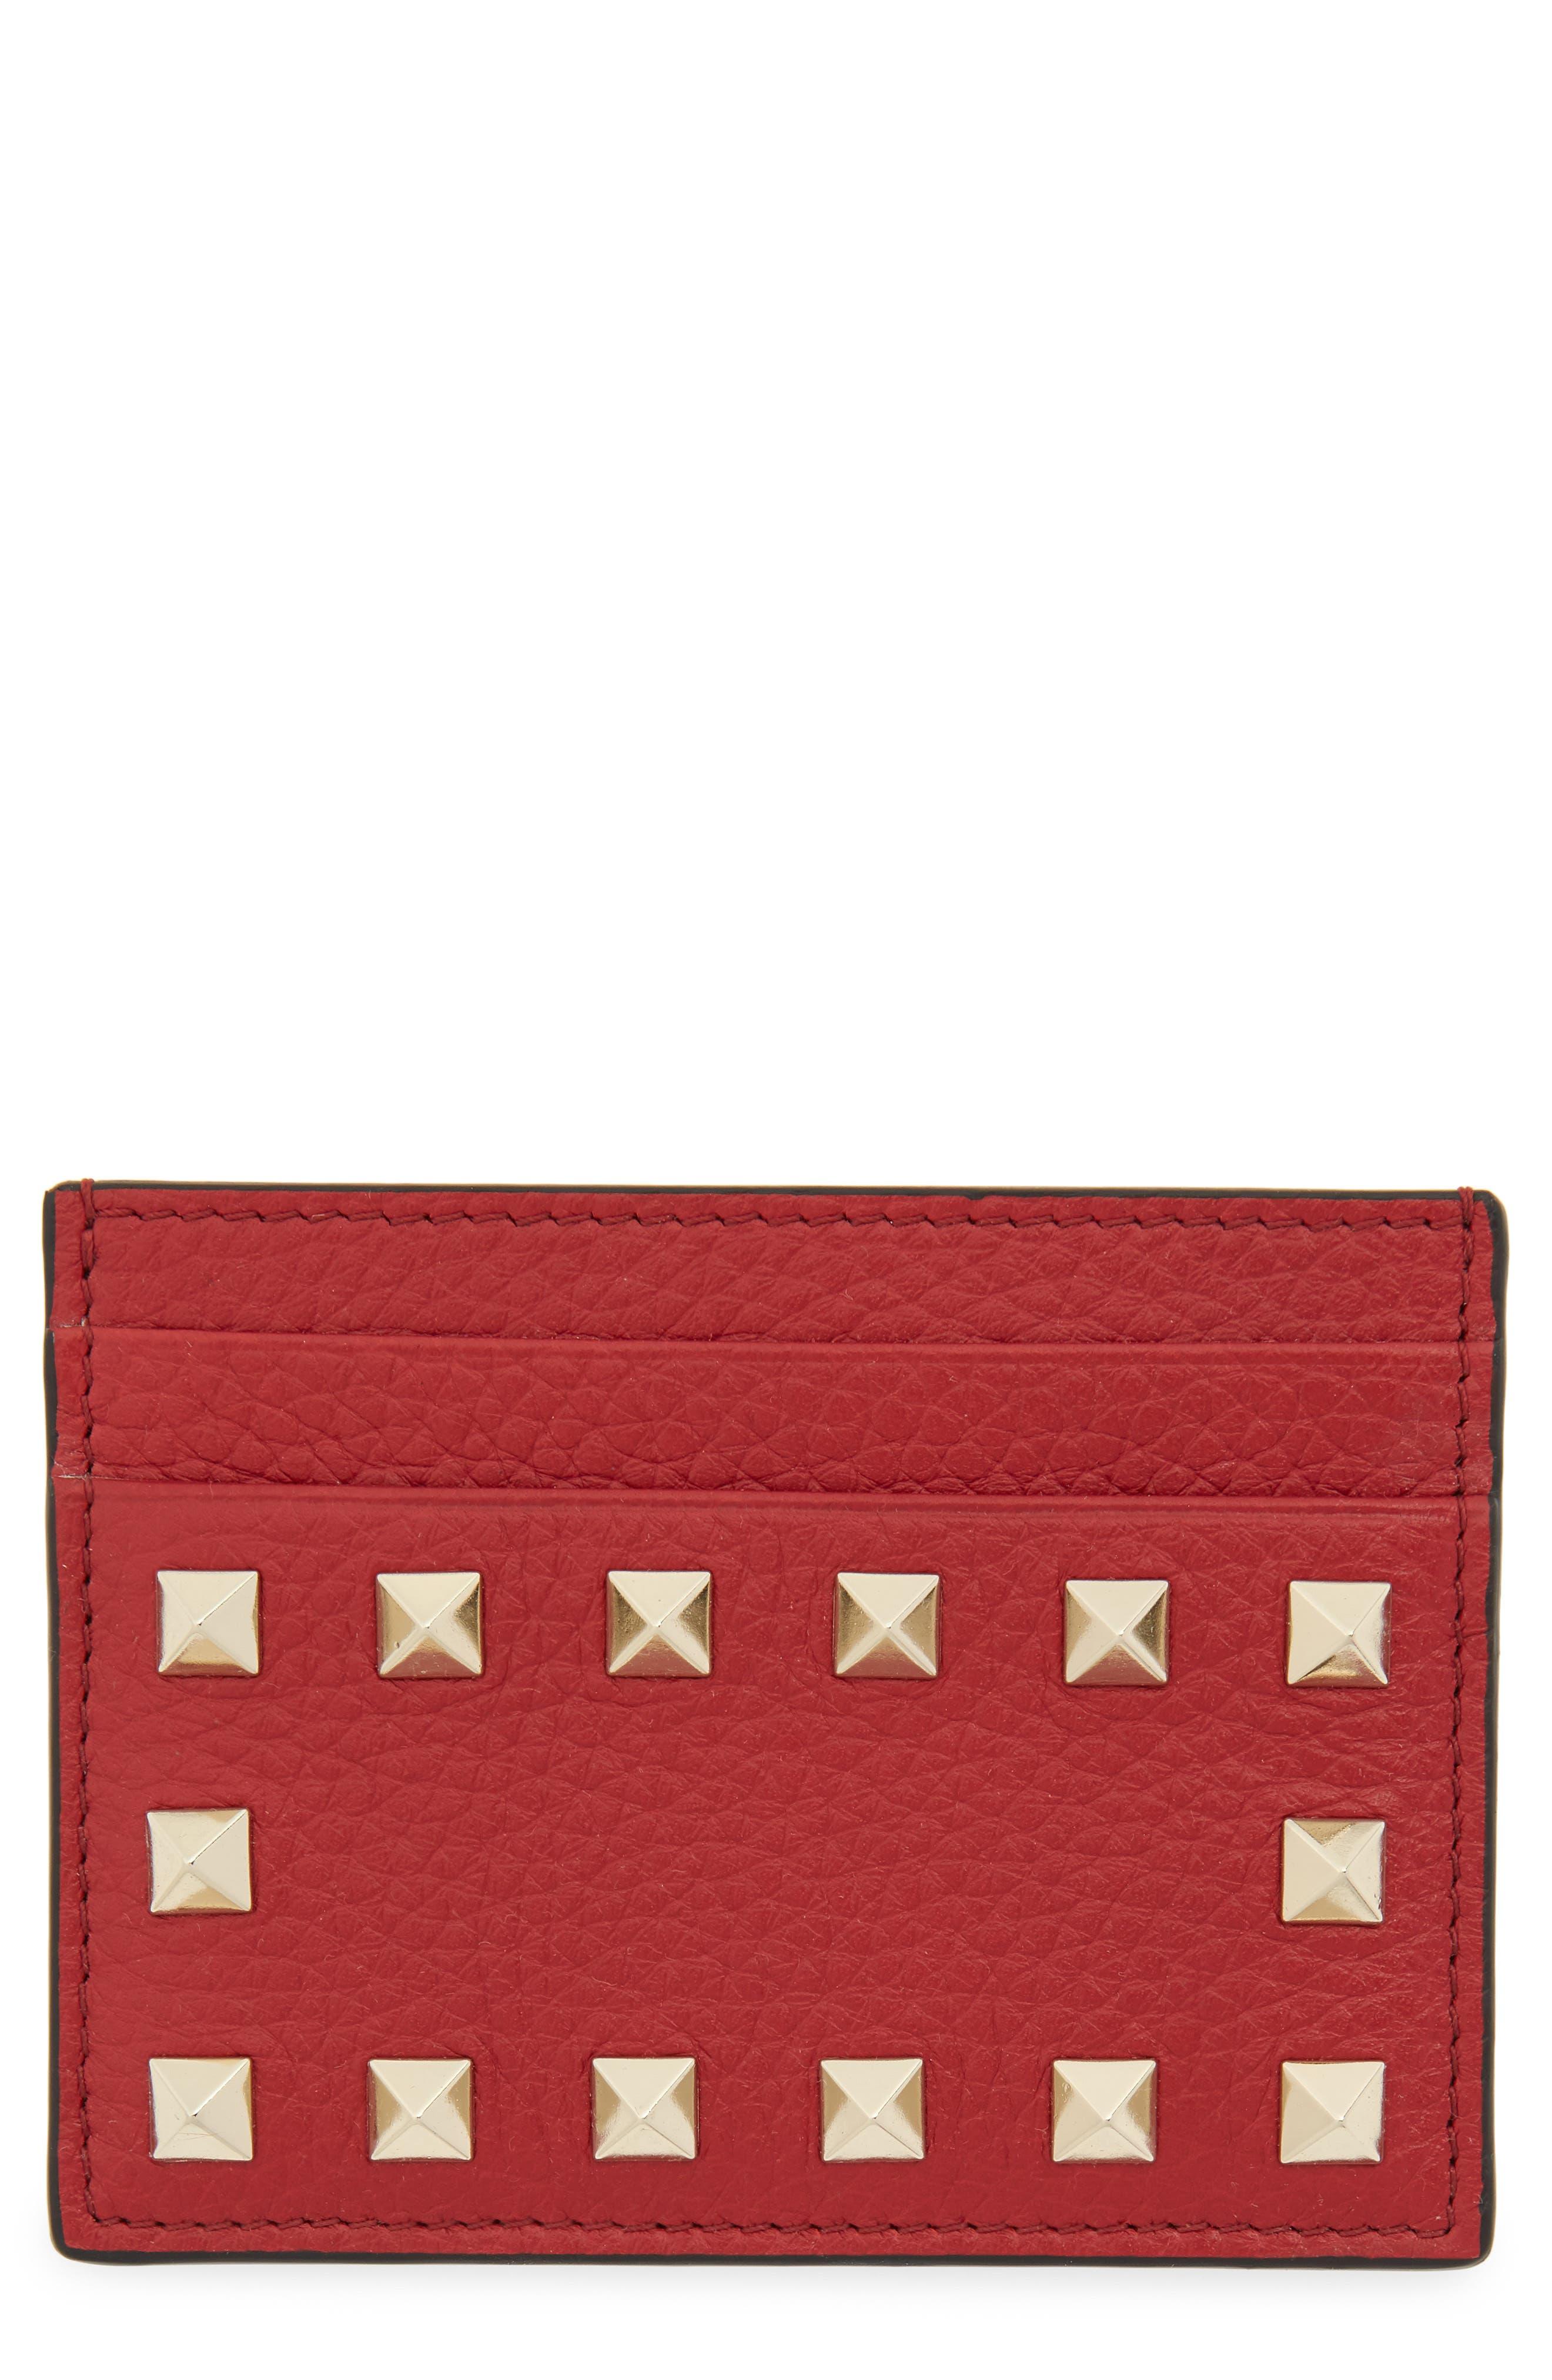 f202a3ec43 Handbags & Wallets for Women   Nordstrom